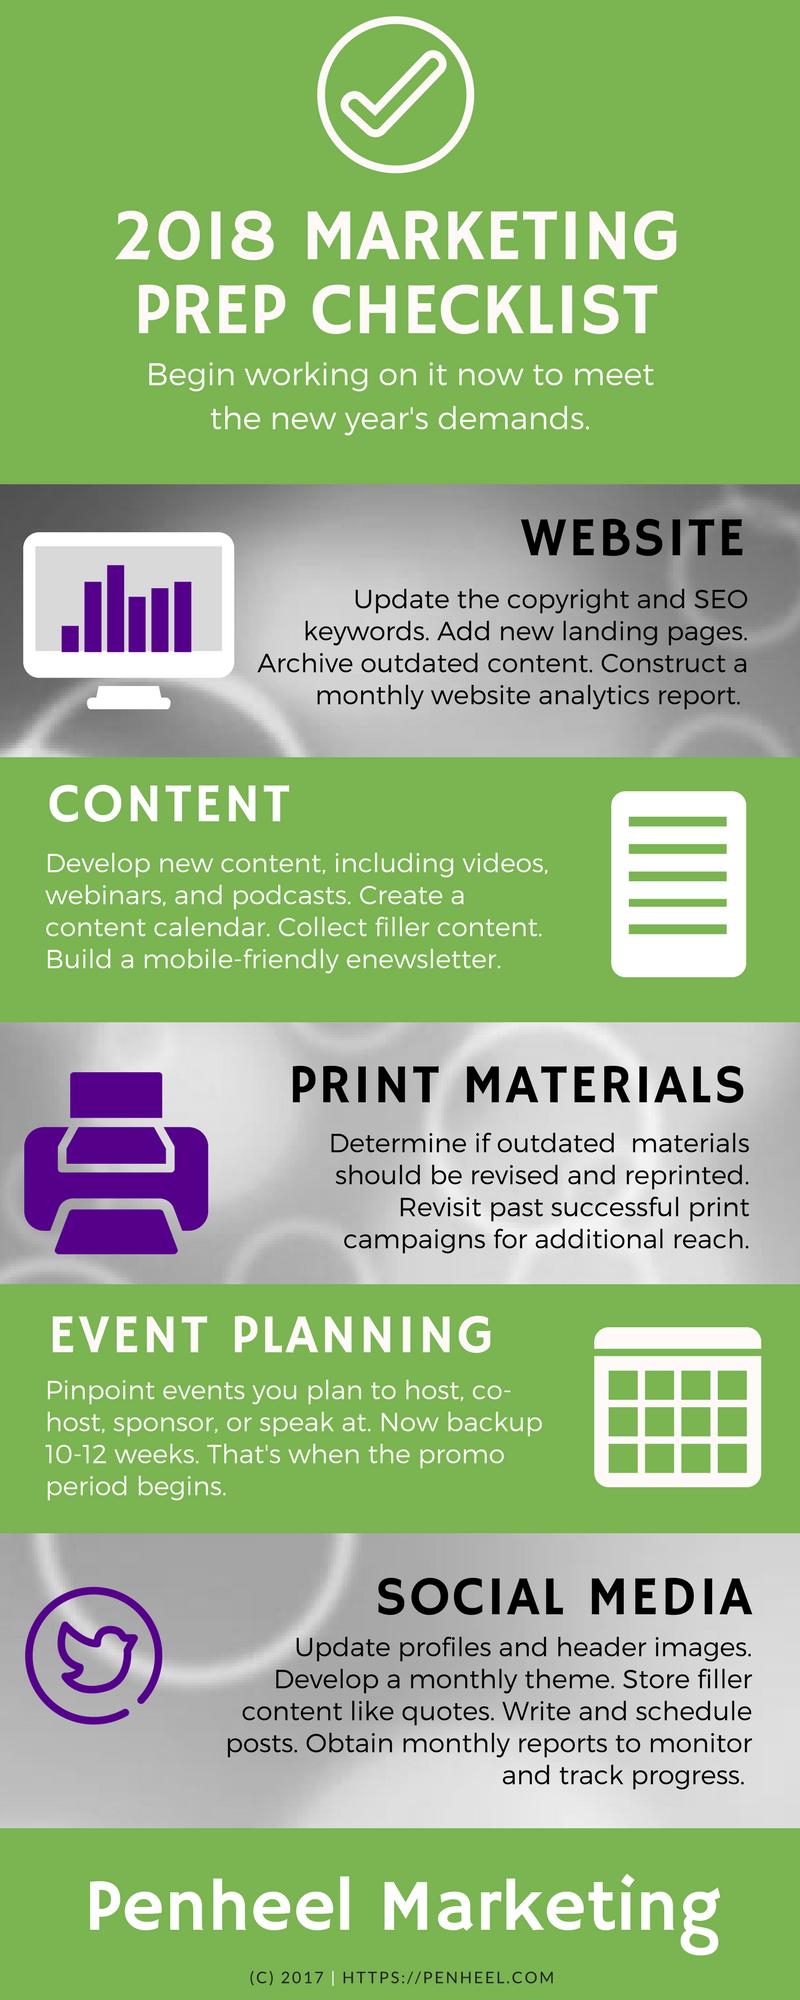 2018 marketing prep checklist_infographic